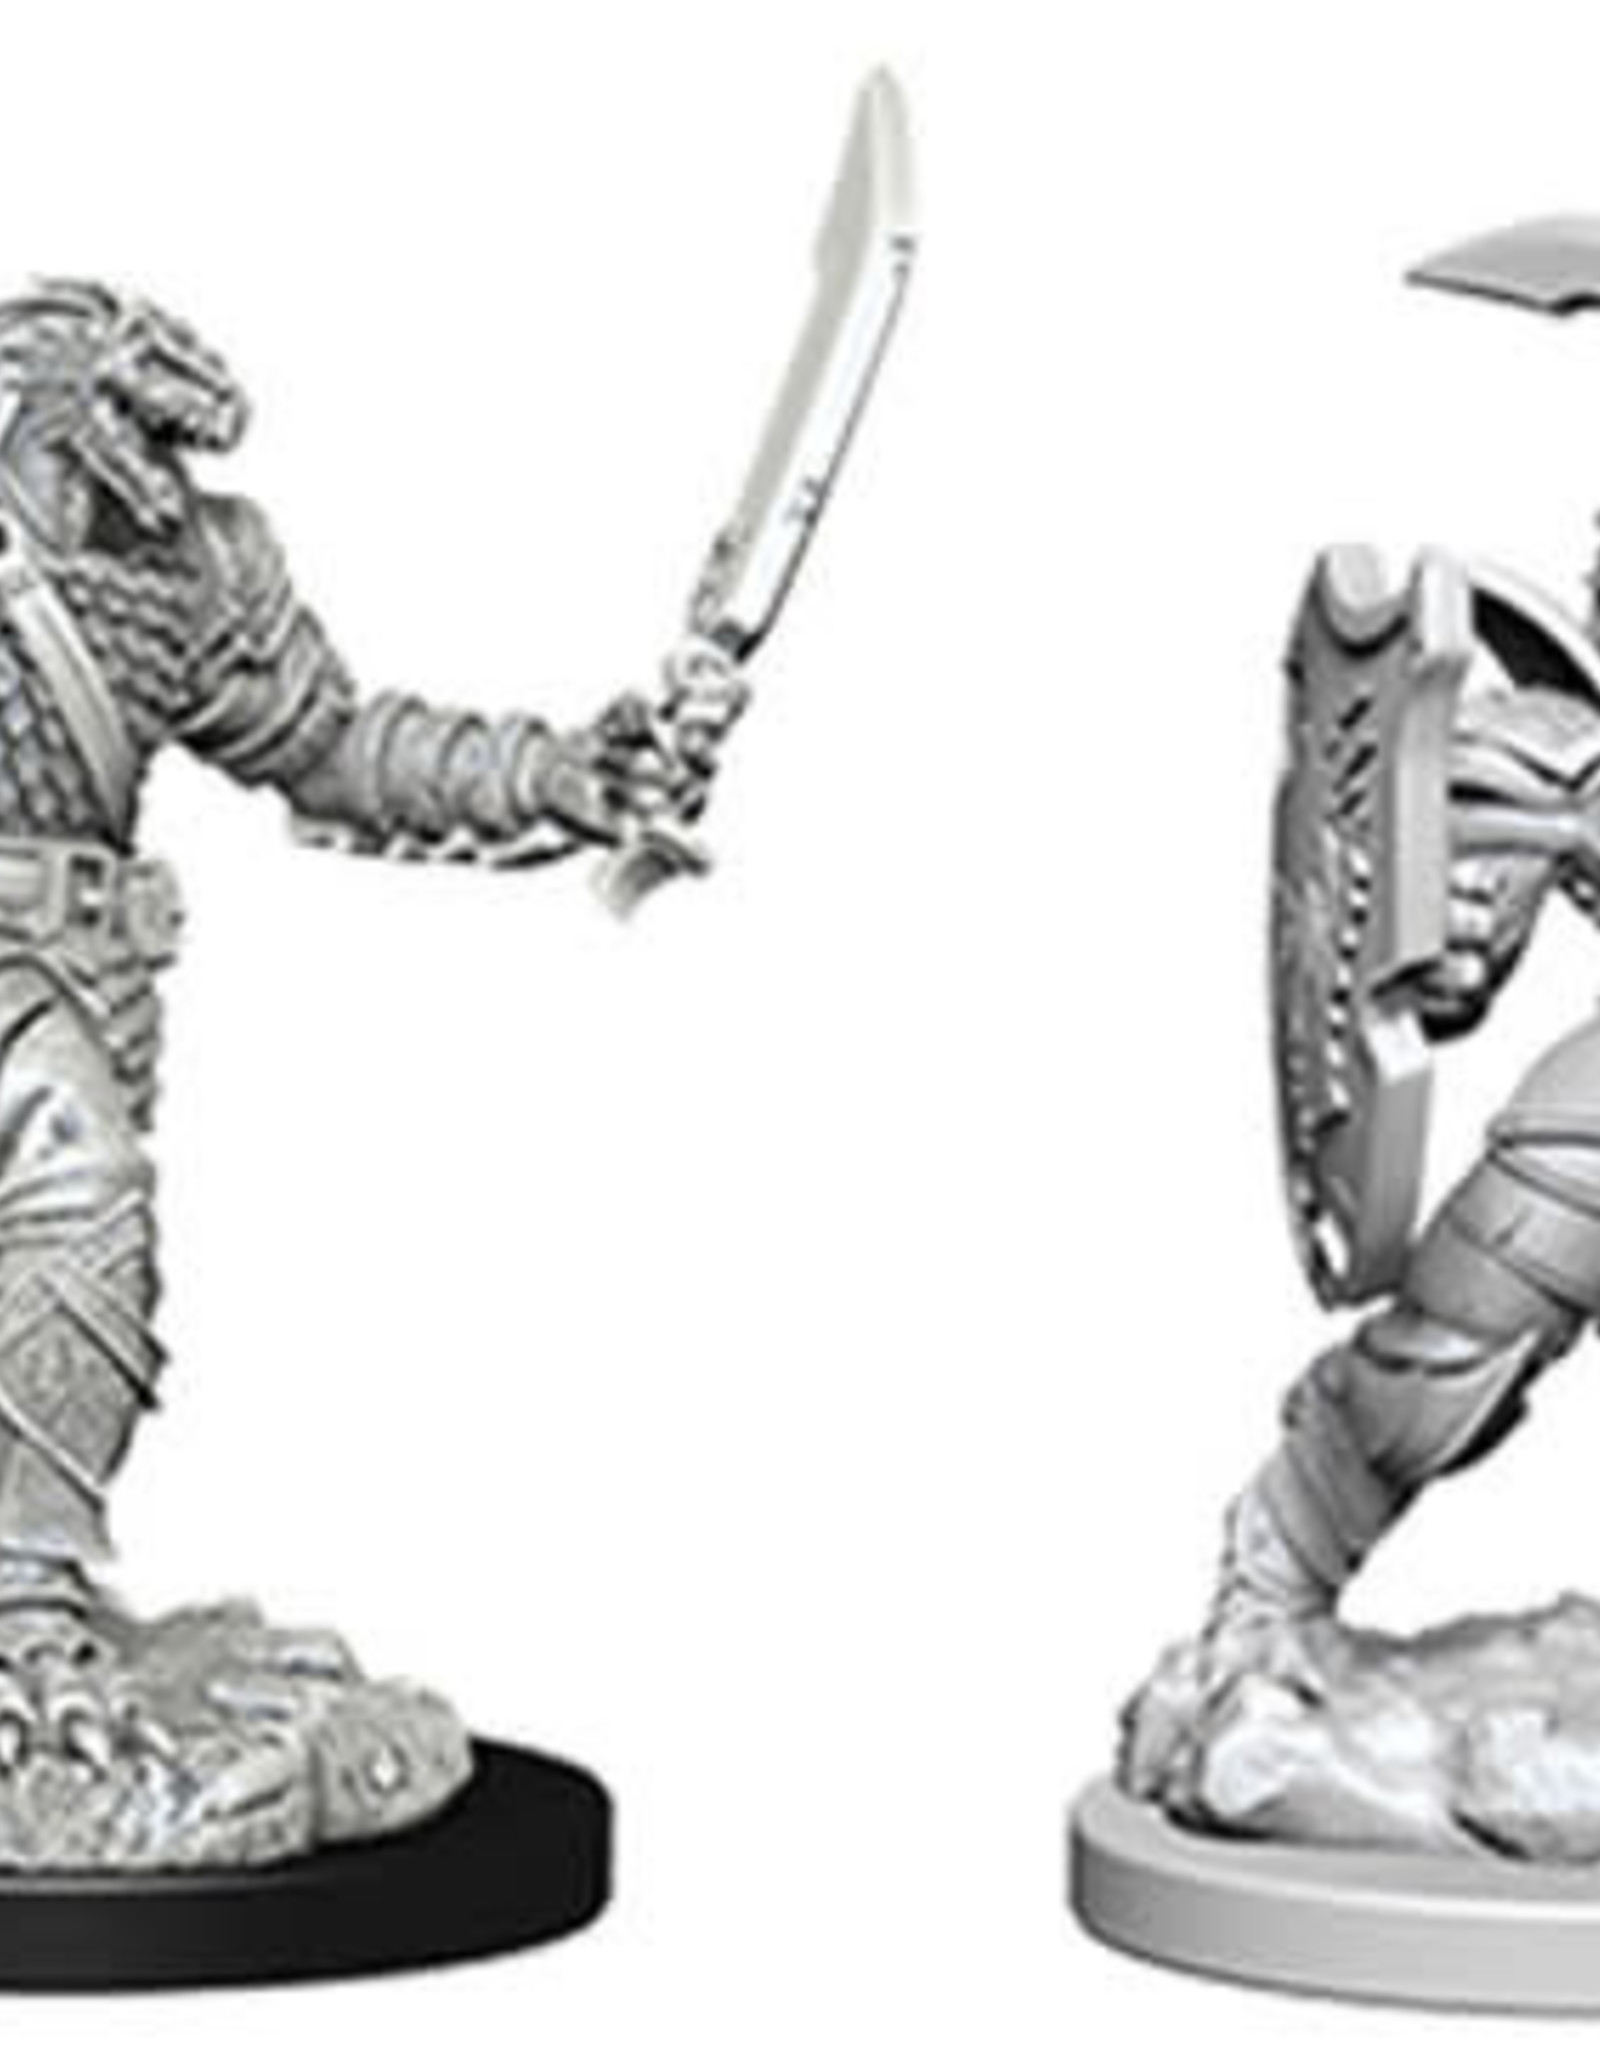 WizKids D&D Nolzur Dragonborn Paladin (She/Her/They/Them)